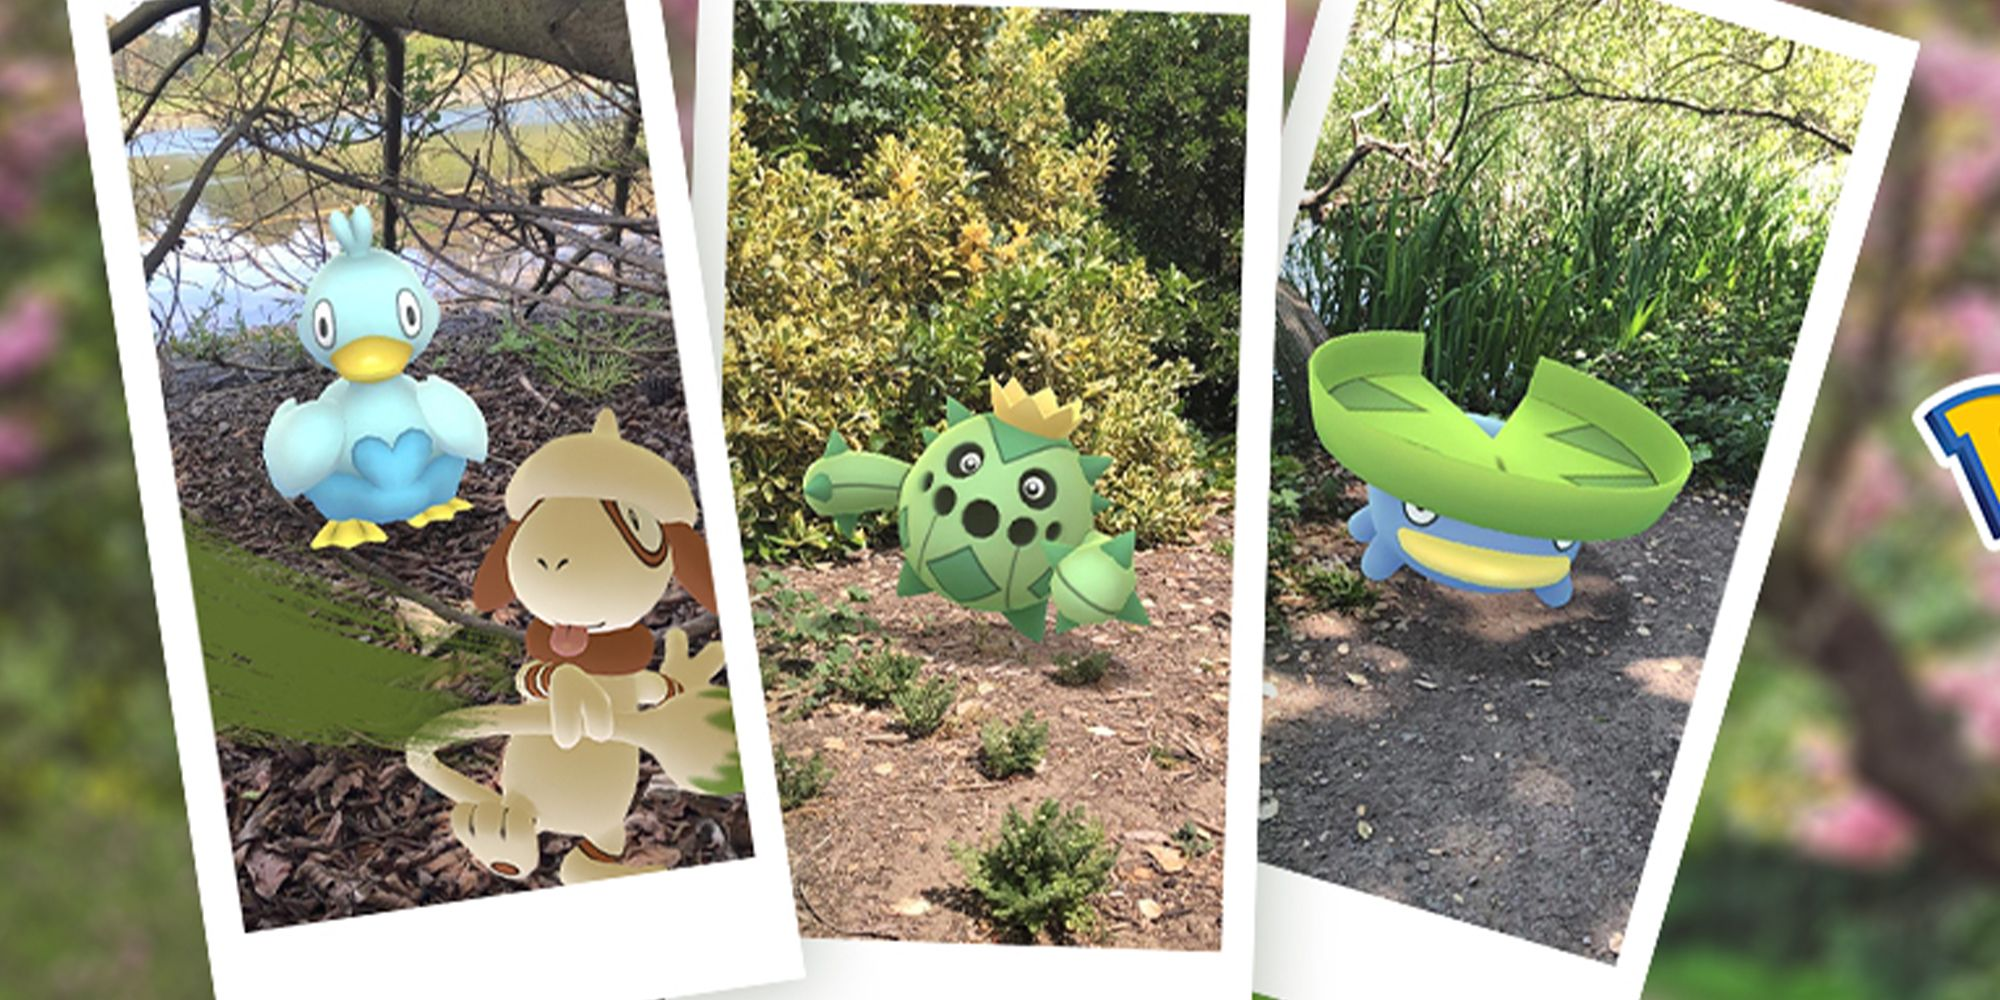 Pokemon Go: New Pokemon Snap Celebration Timed Research Tasks and Rewards